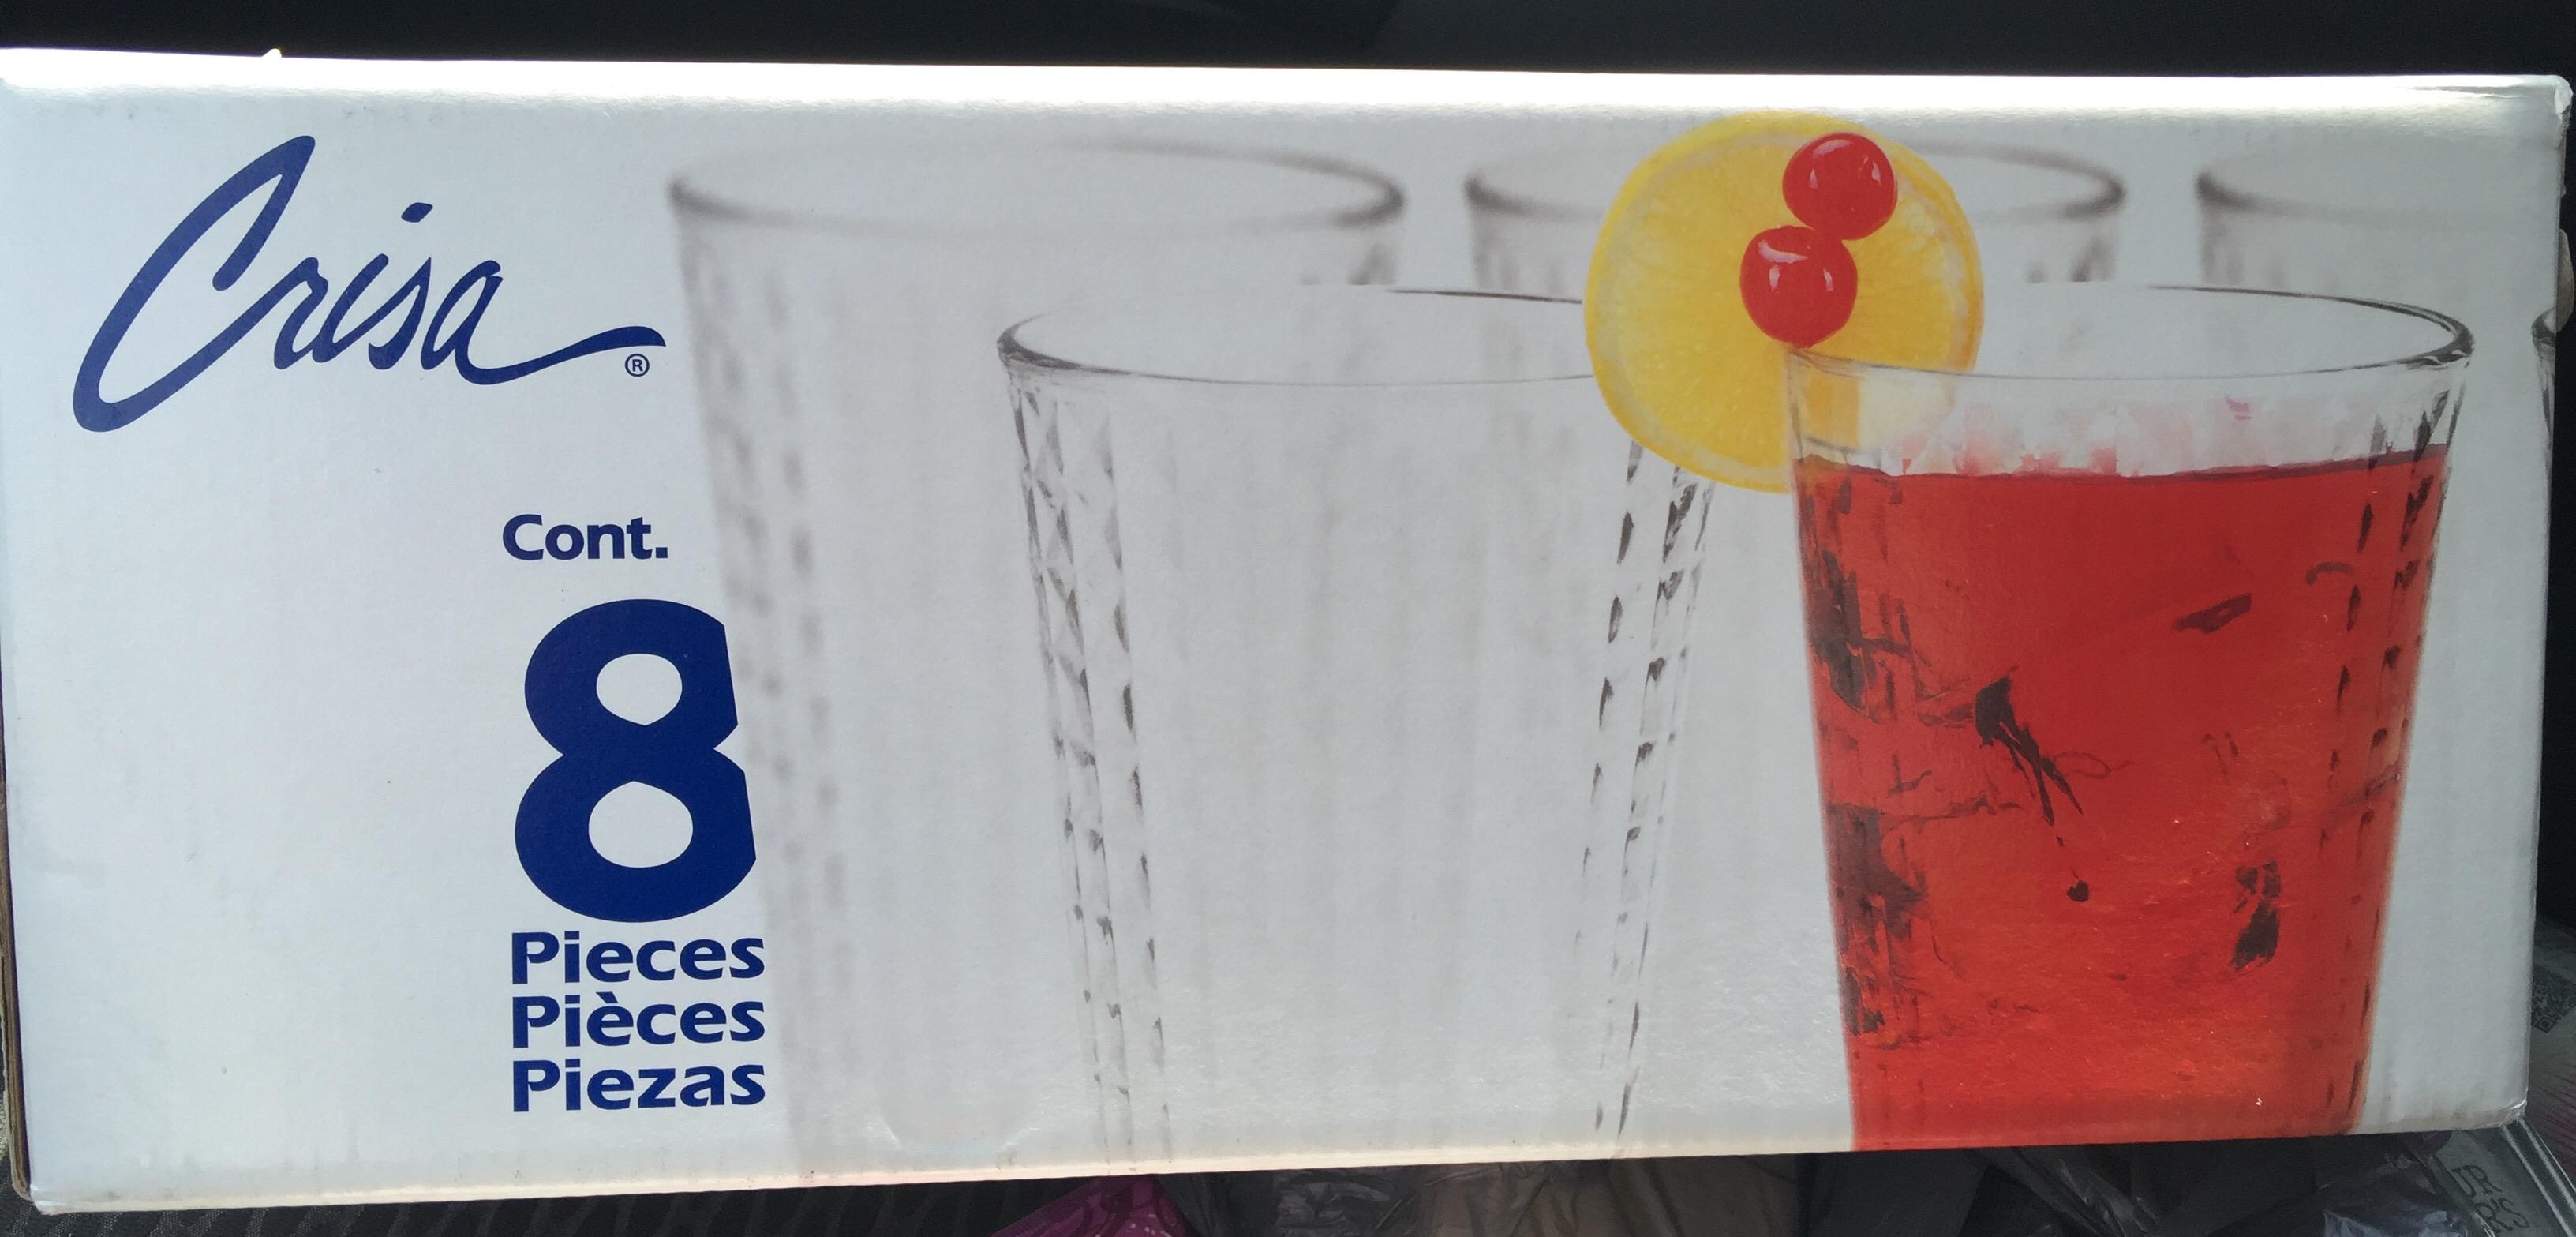 Bodega Aurrerá : liquidación de set de 8 vasos Crisa a 7.04